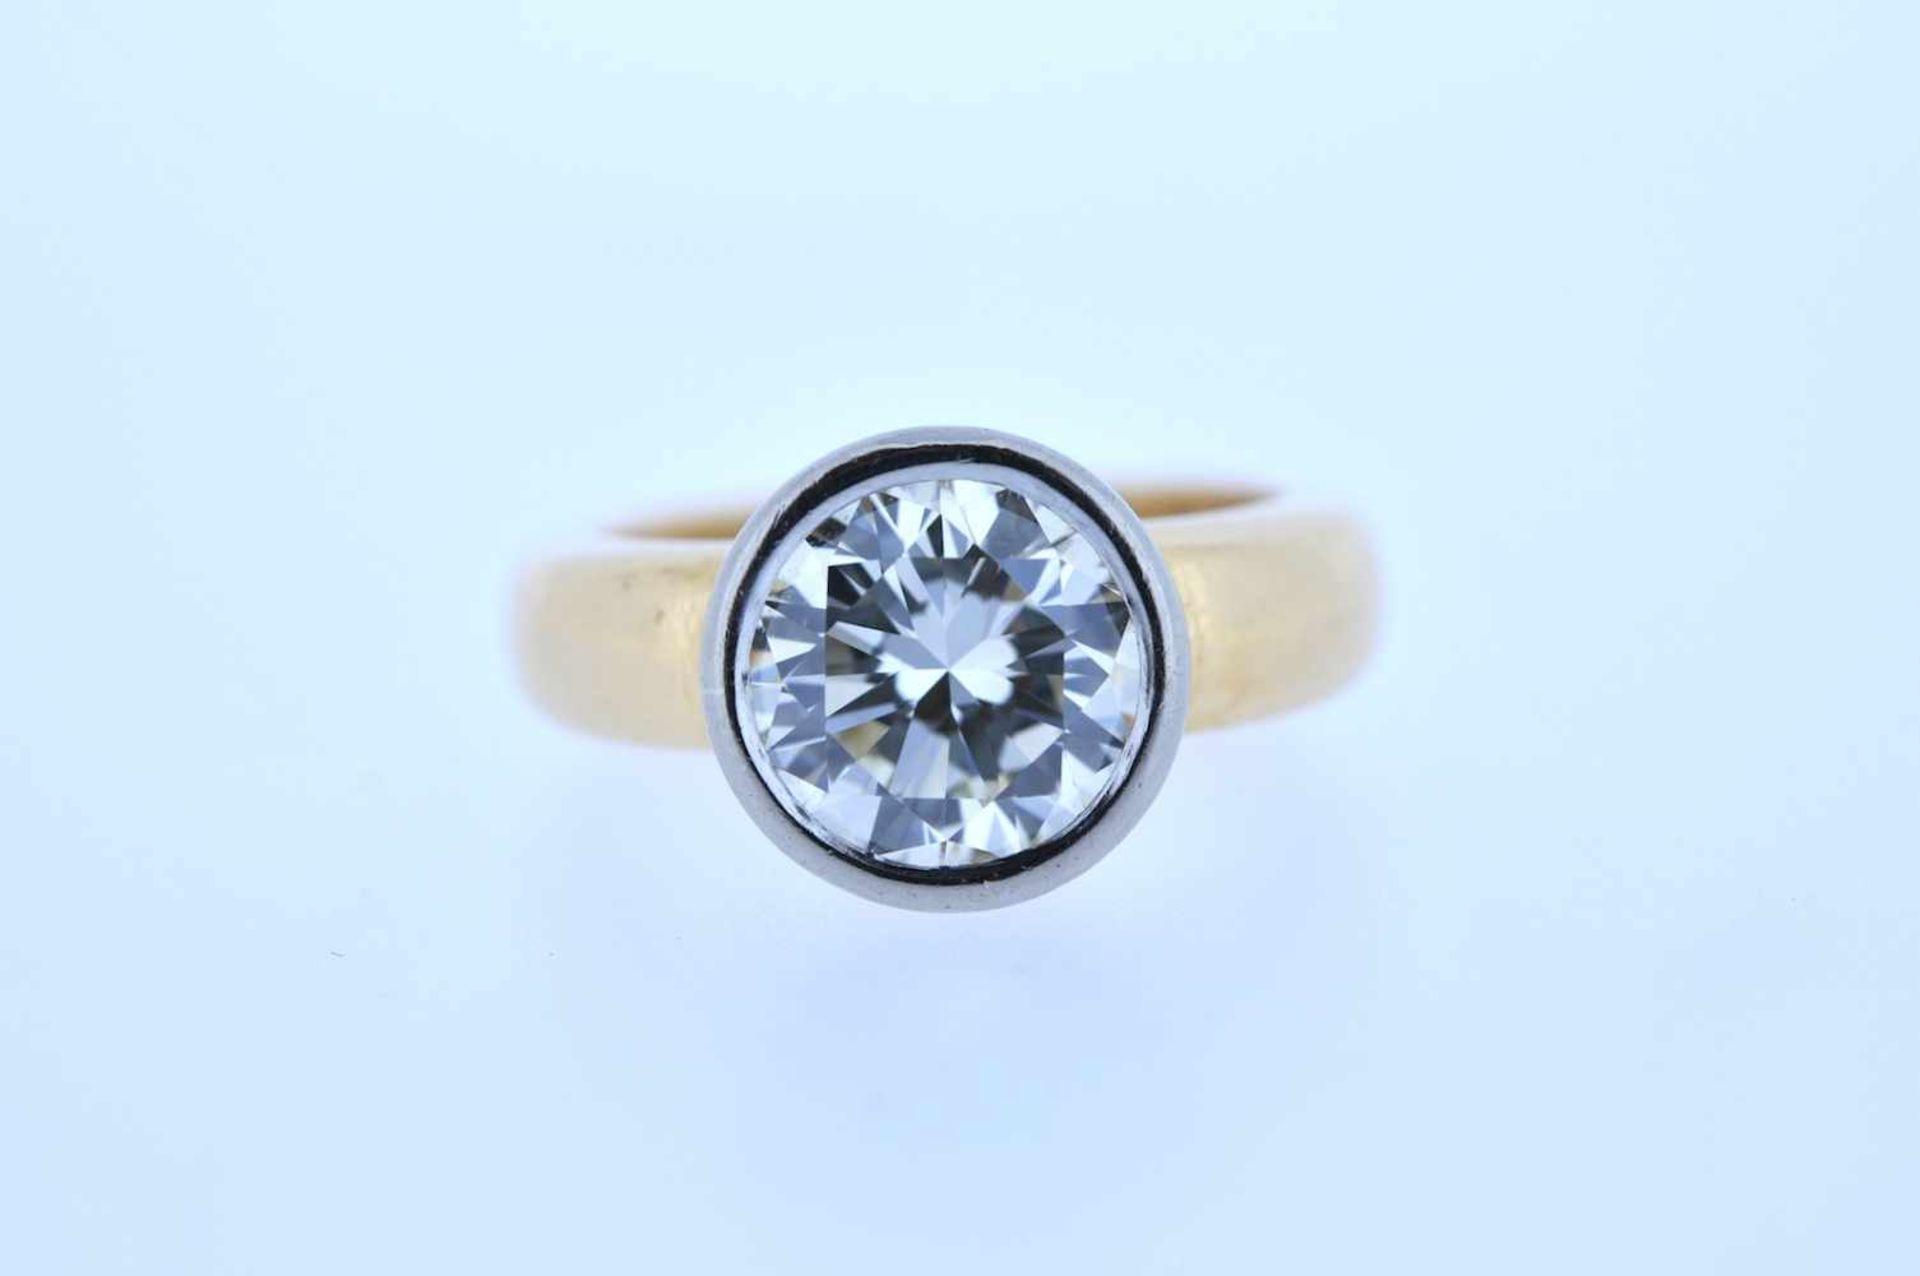 Los 46 - Ring Goldener 18kt Ring mit einem Brillant, ca. 3 ct, Ringweite 50, 9,38 g. Ring Ring with one round